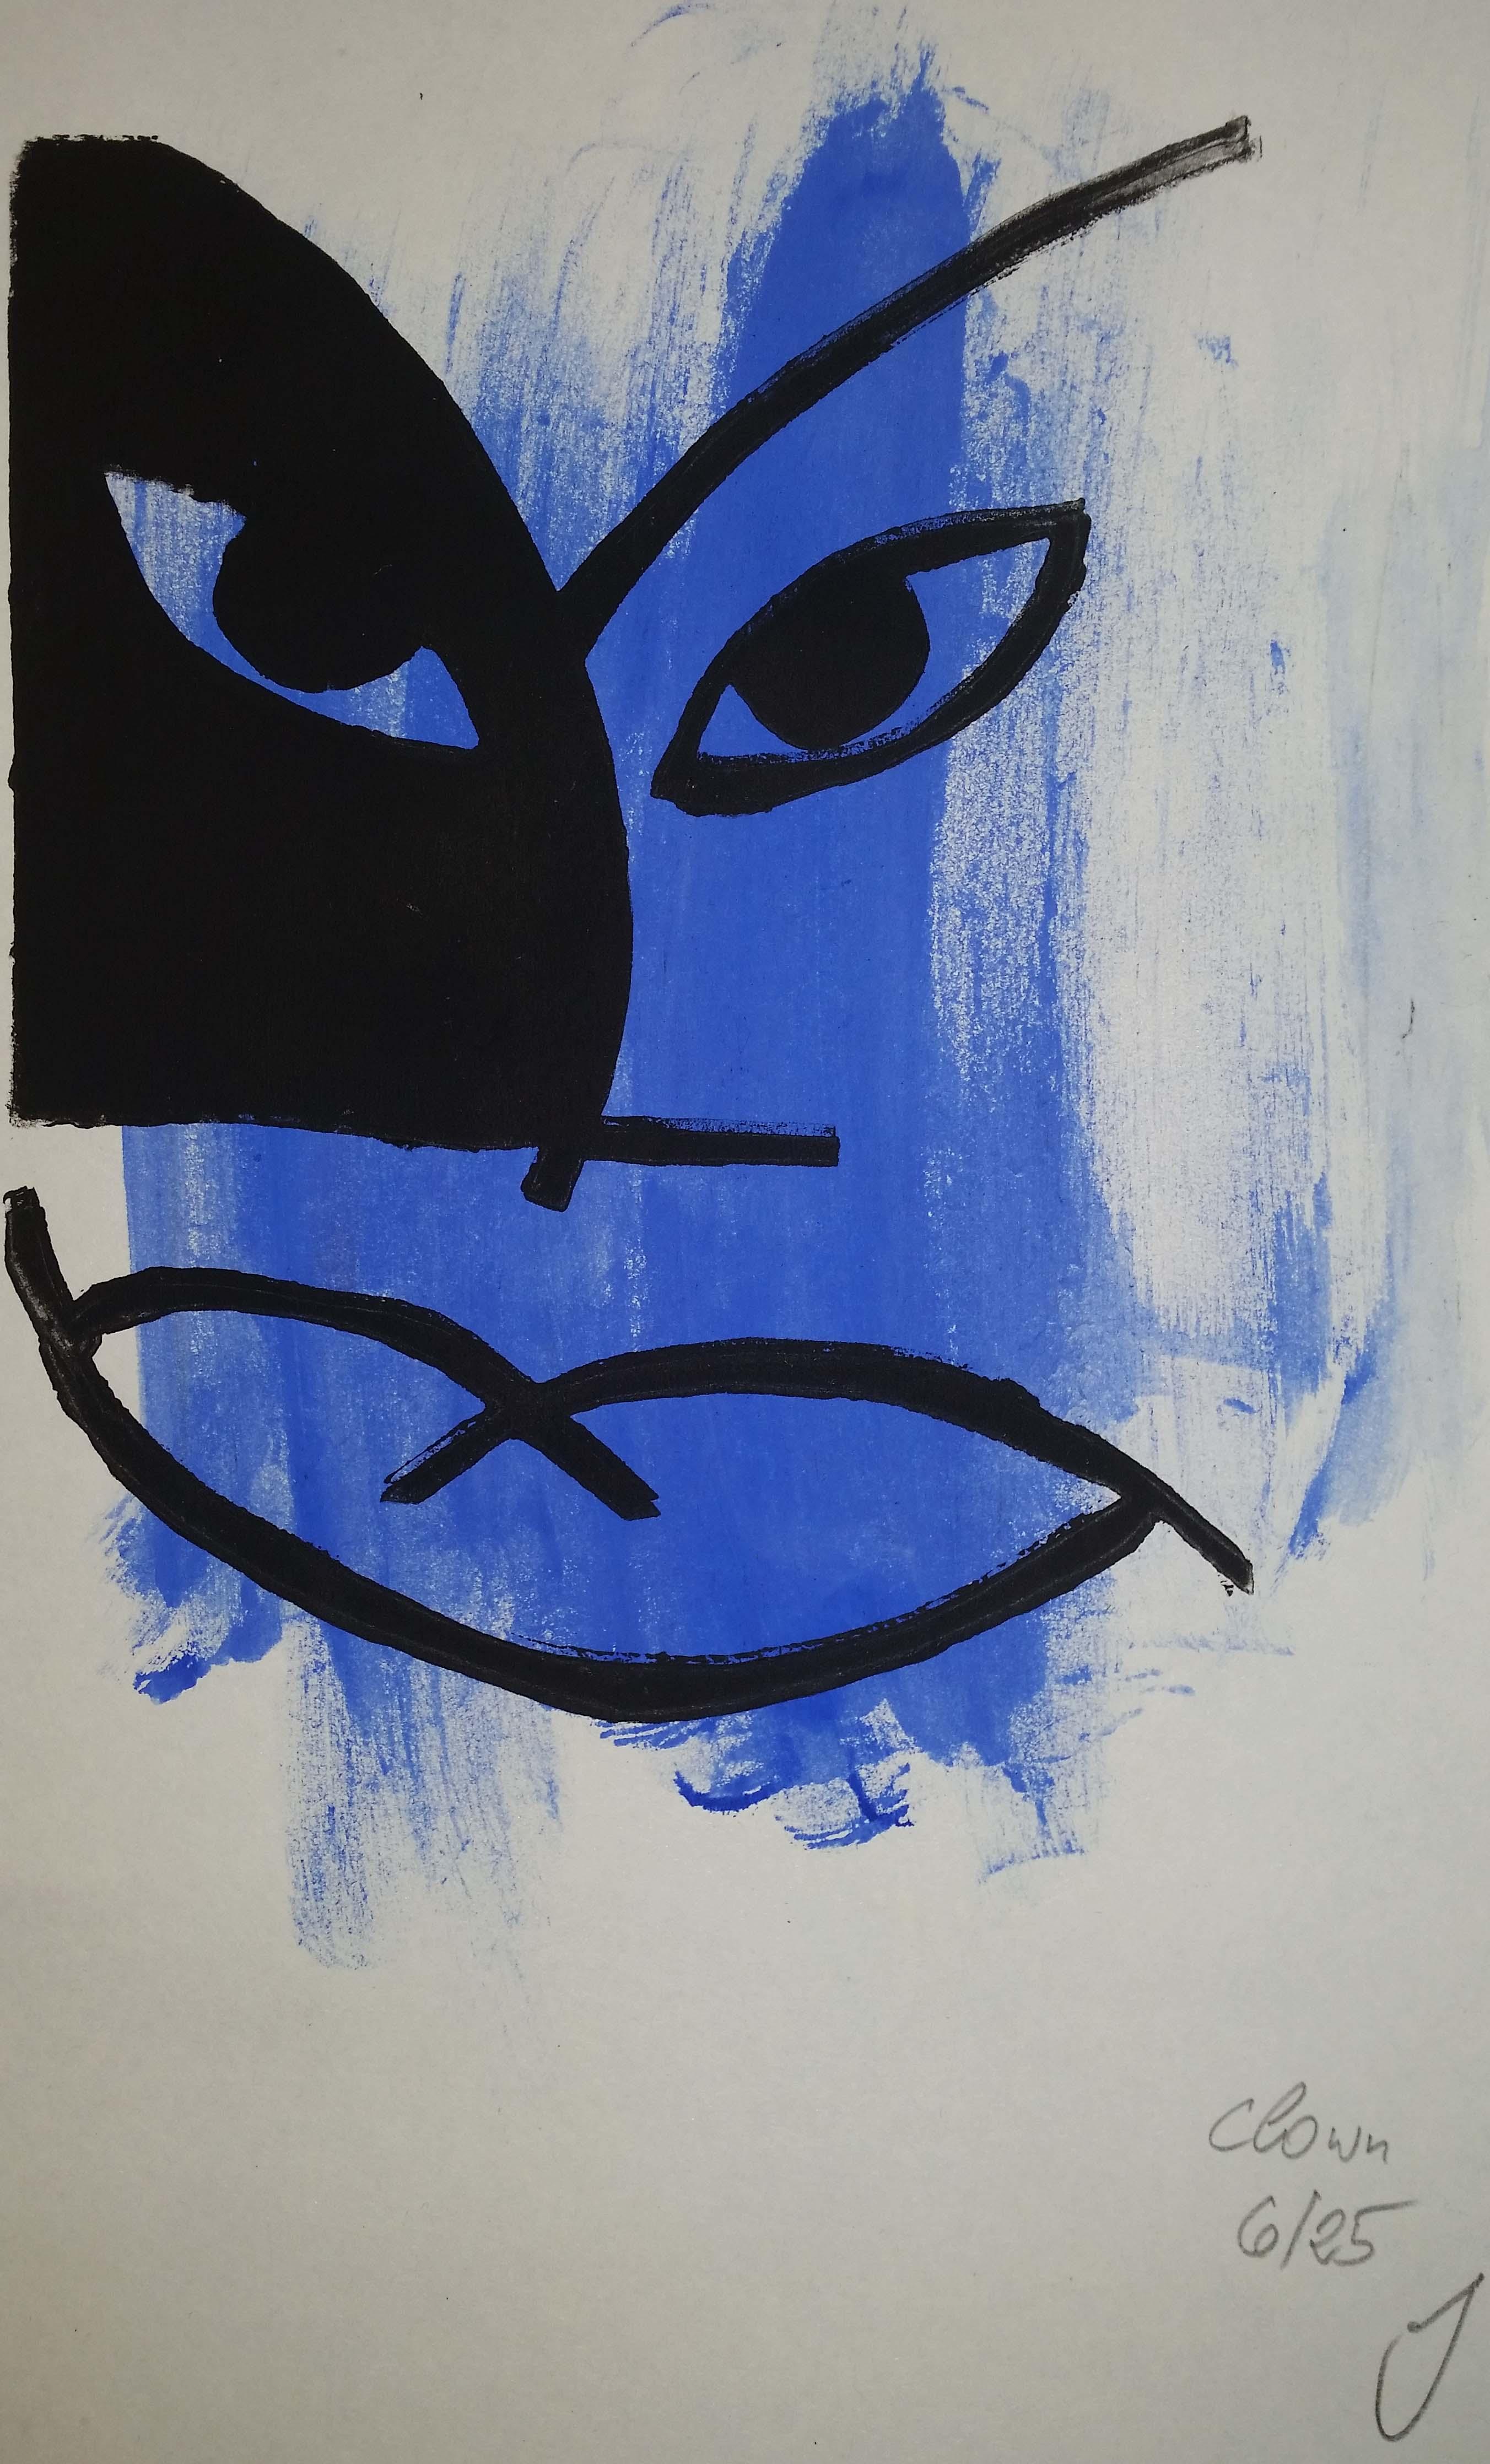 der-clown-Zwei-Farben-Linolschnitt2